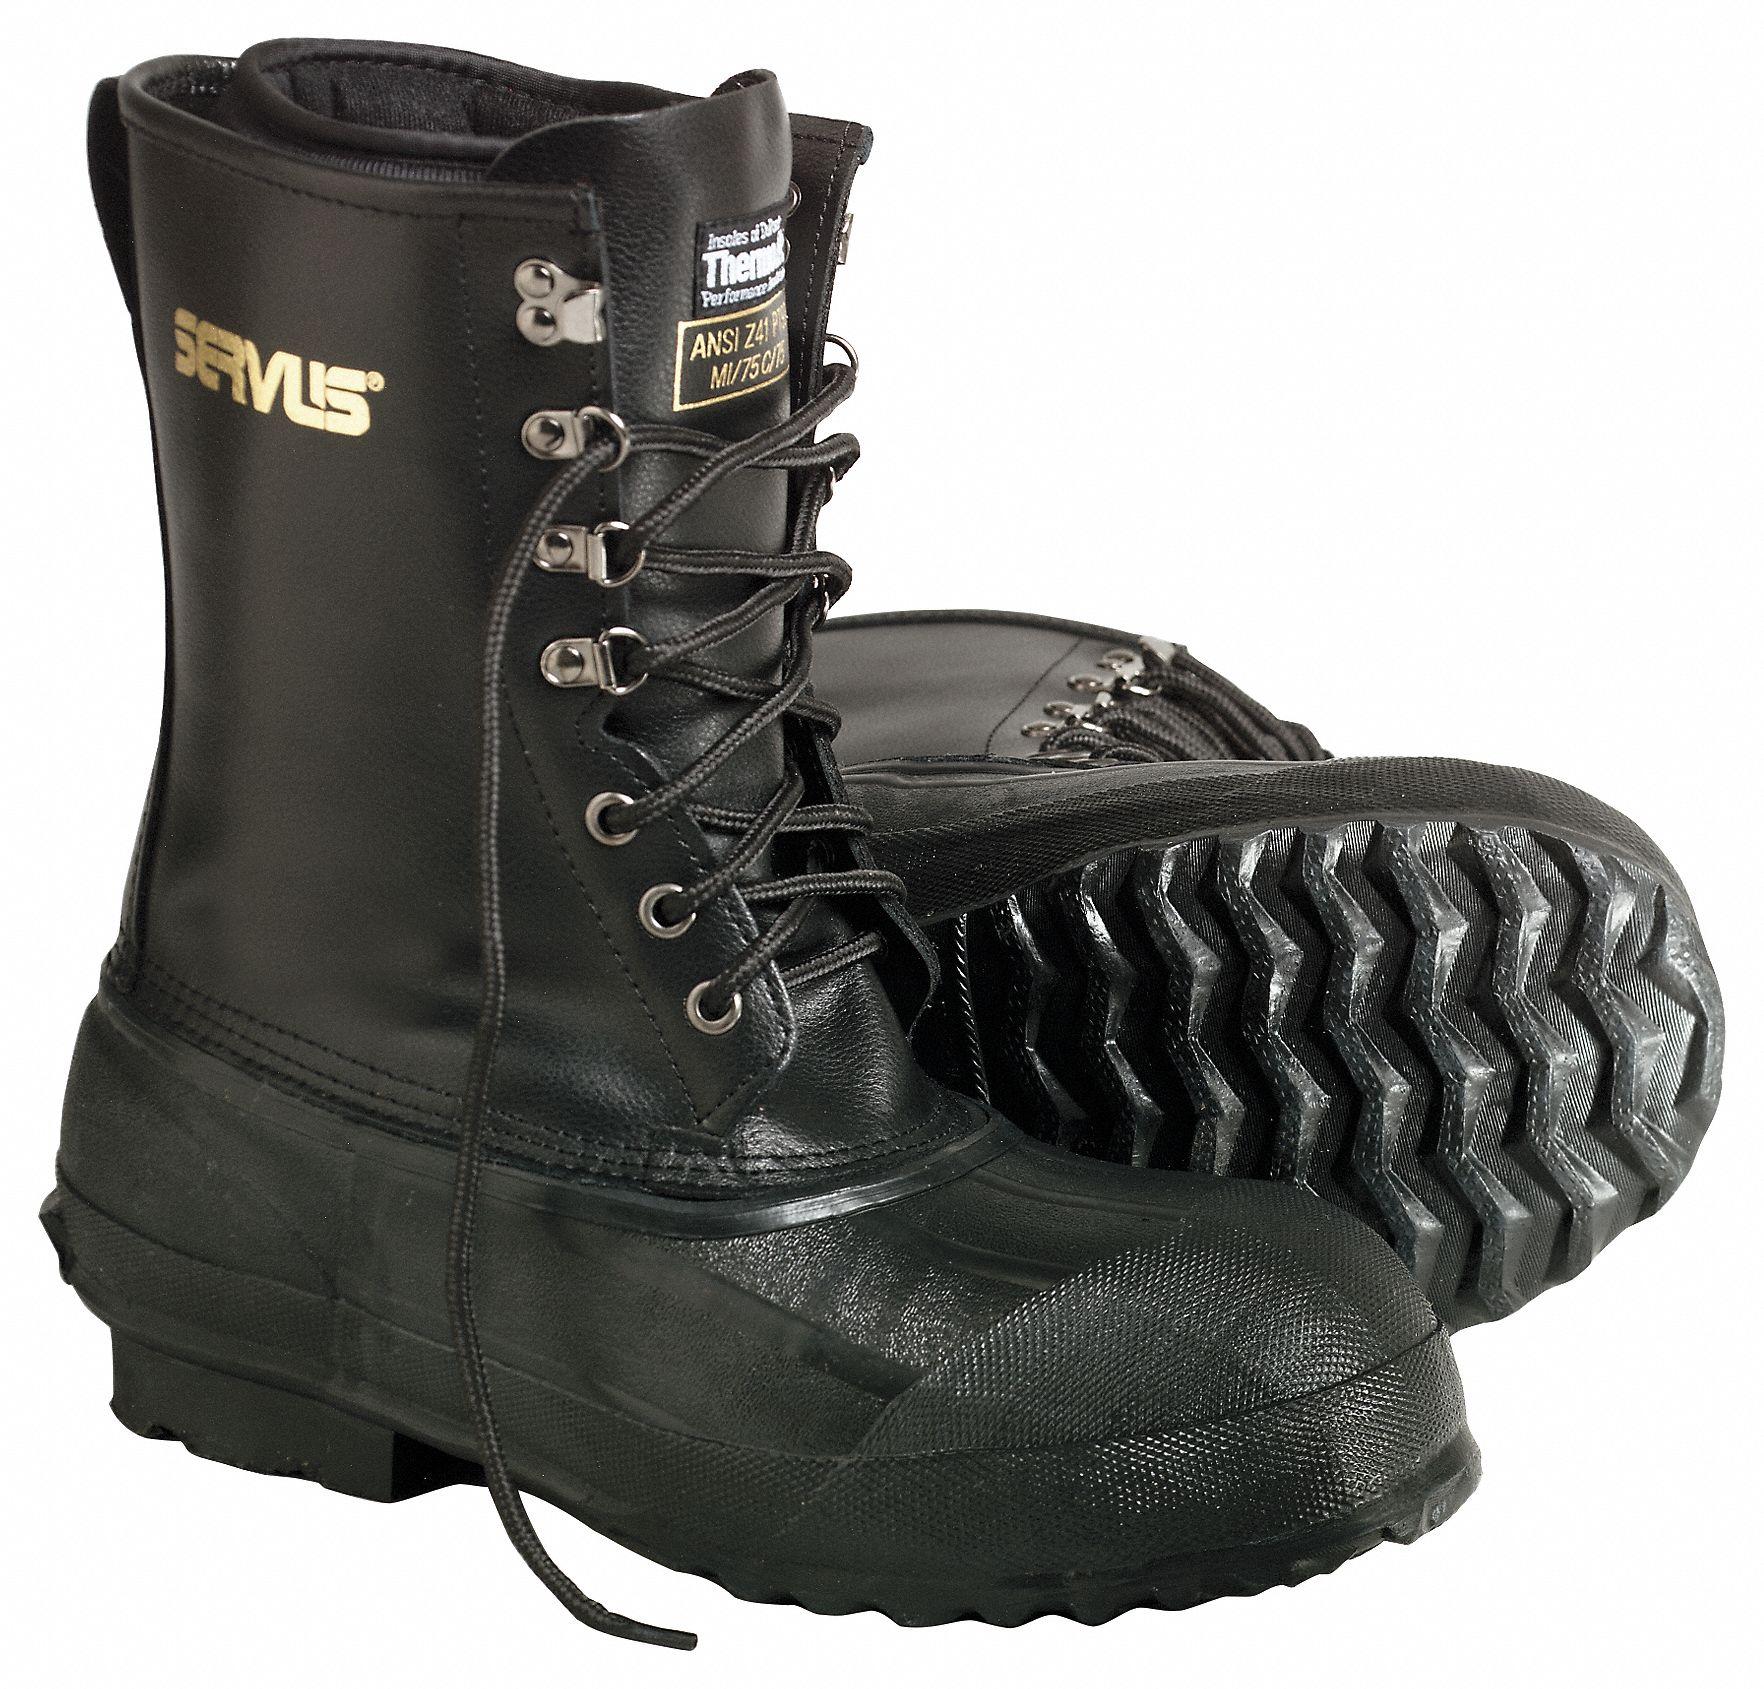 RANGER BY HONEYWELL Men s Winter Boots c80583b52670